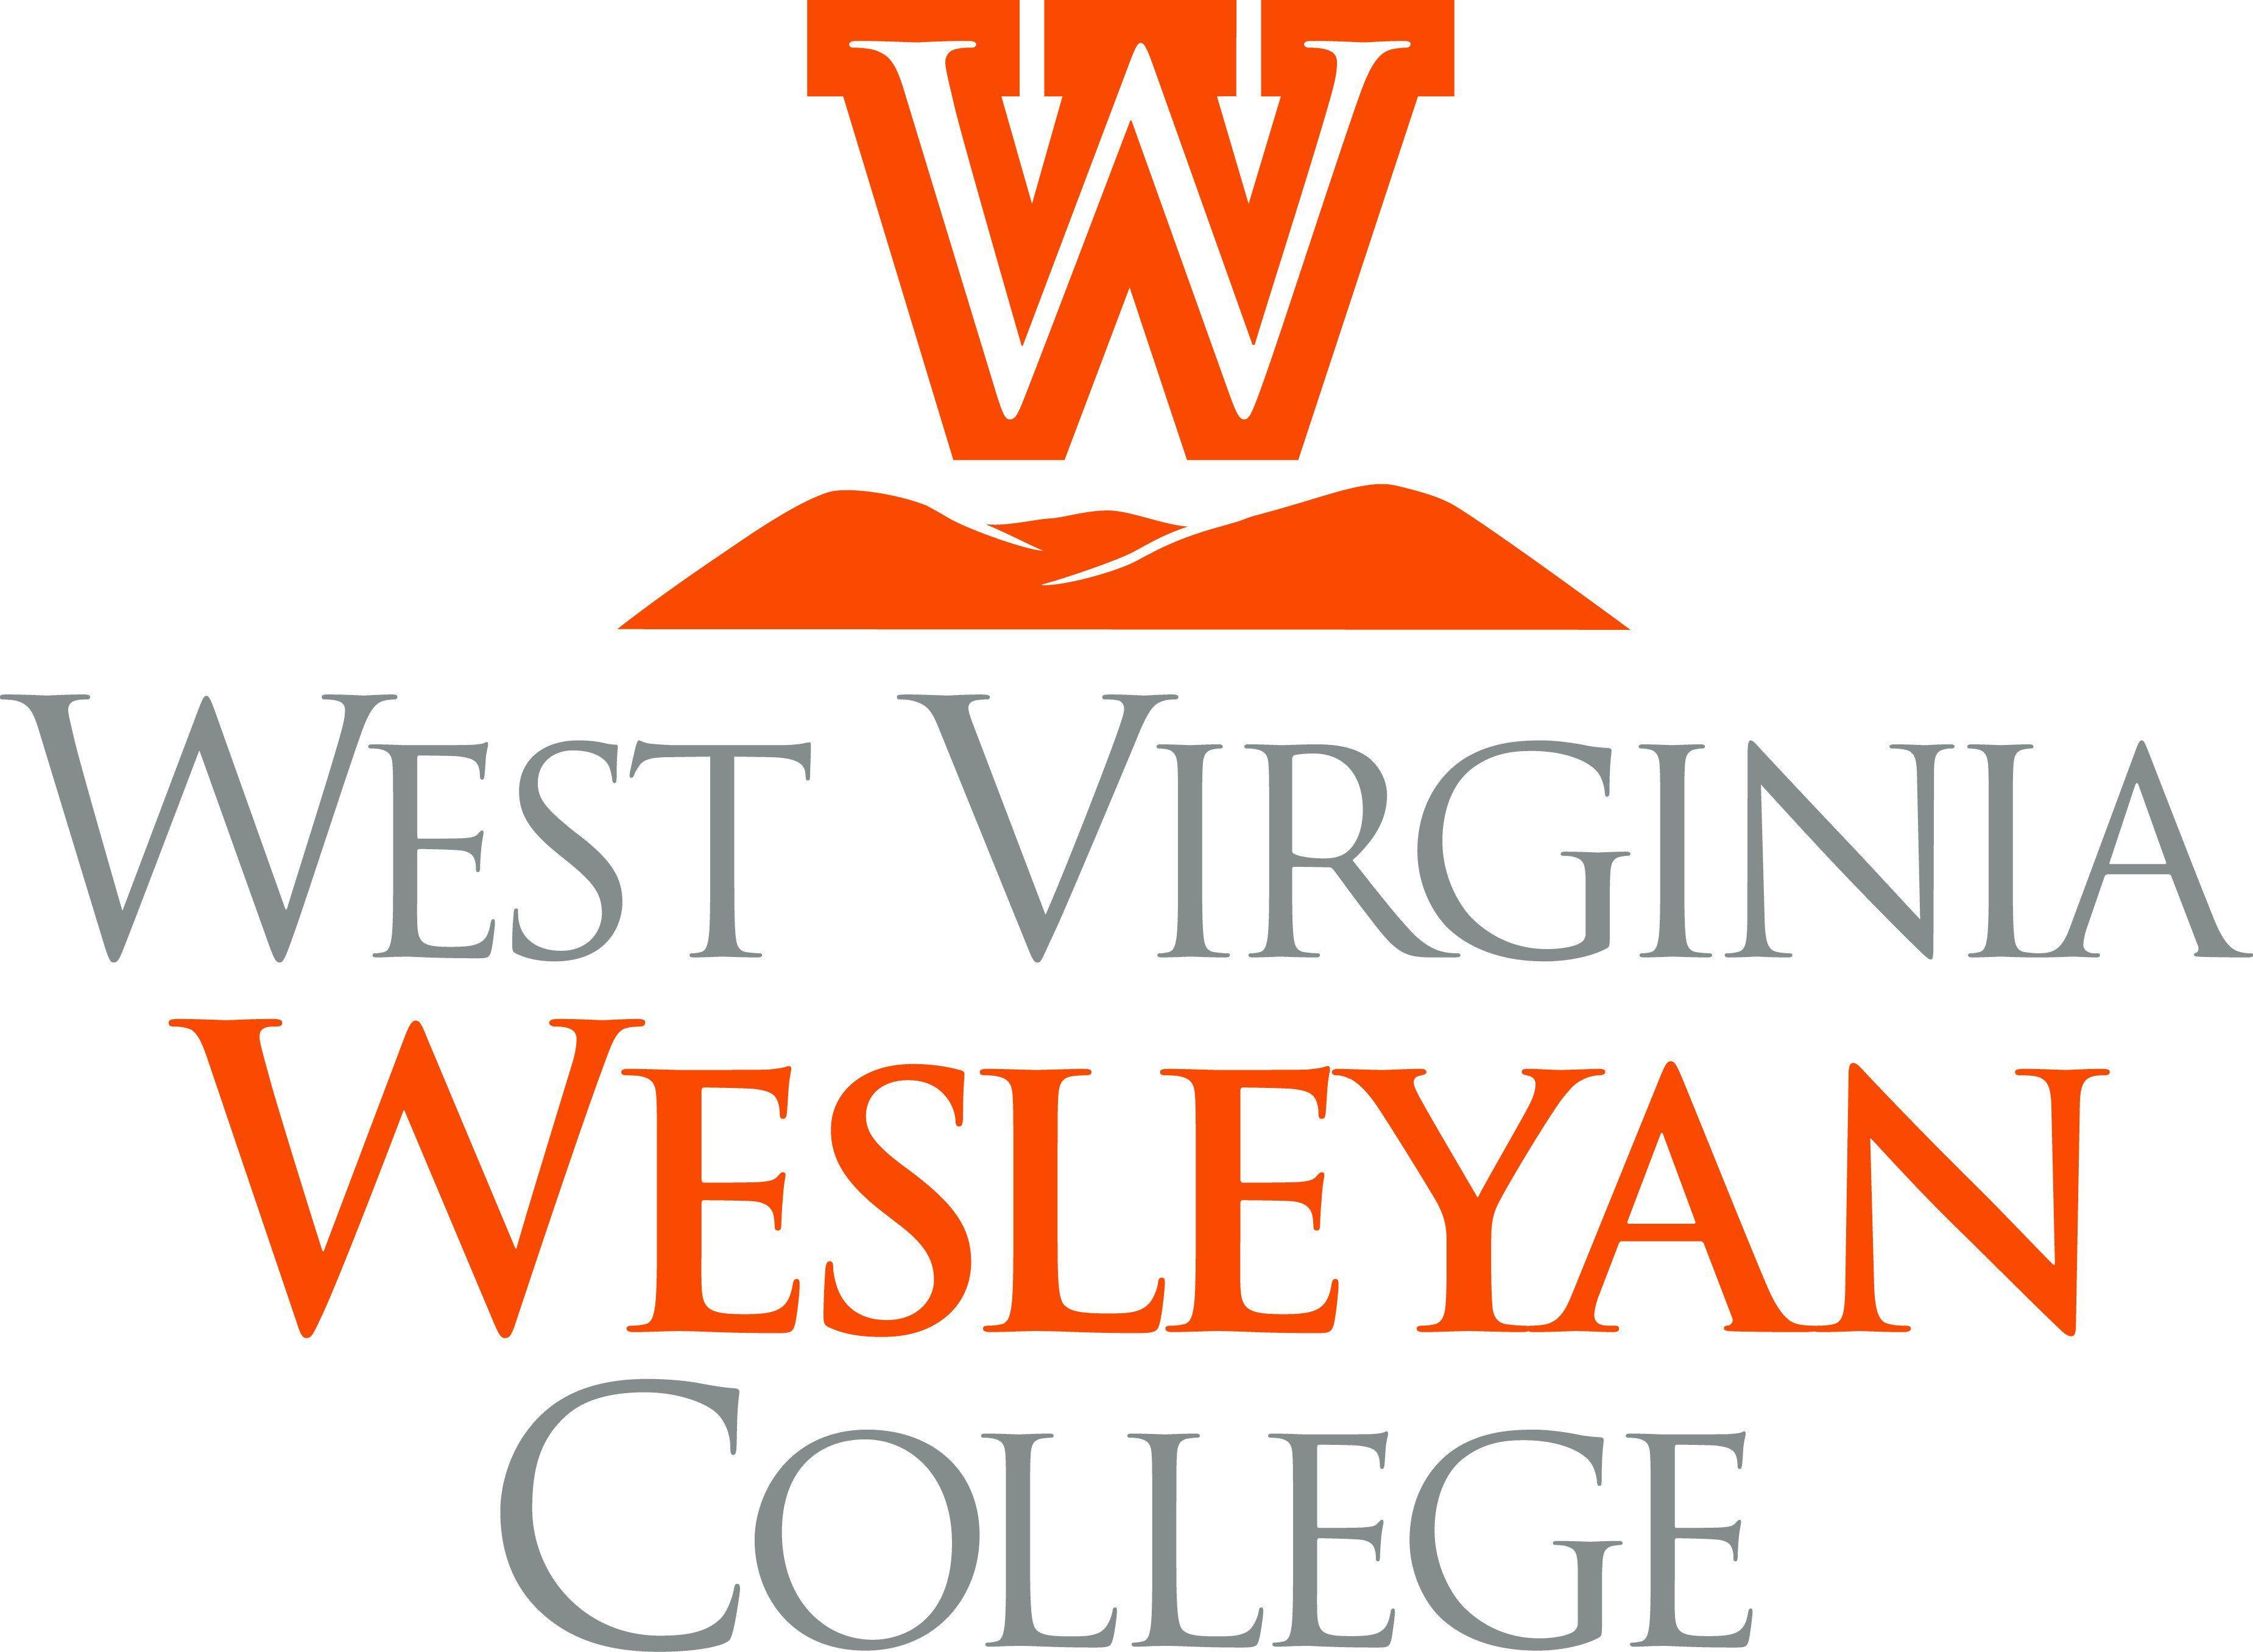 West Virginia Wesleyan College Logo West Virginia College Logo Education Information